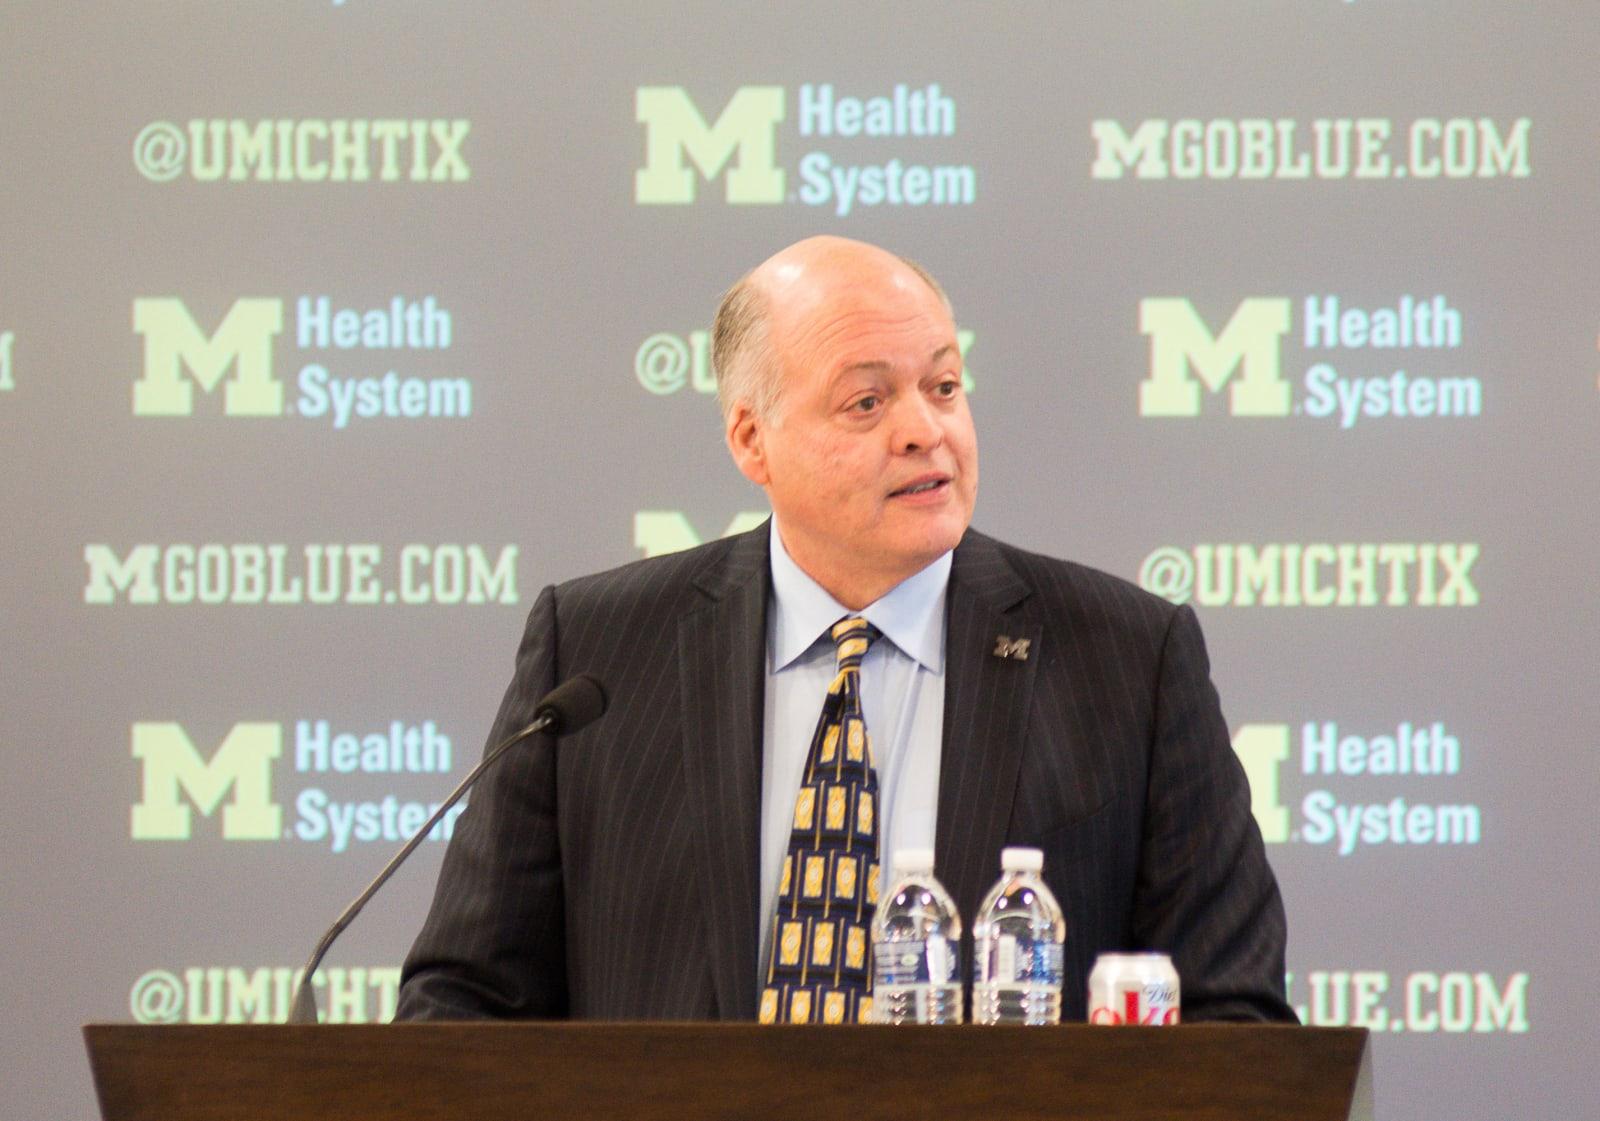 NCAA FOOTBALL: DEC 30 Jim Harbaugh Introduced as Michigan Head Coach